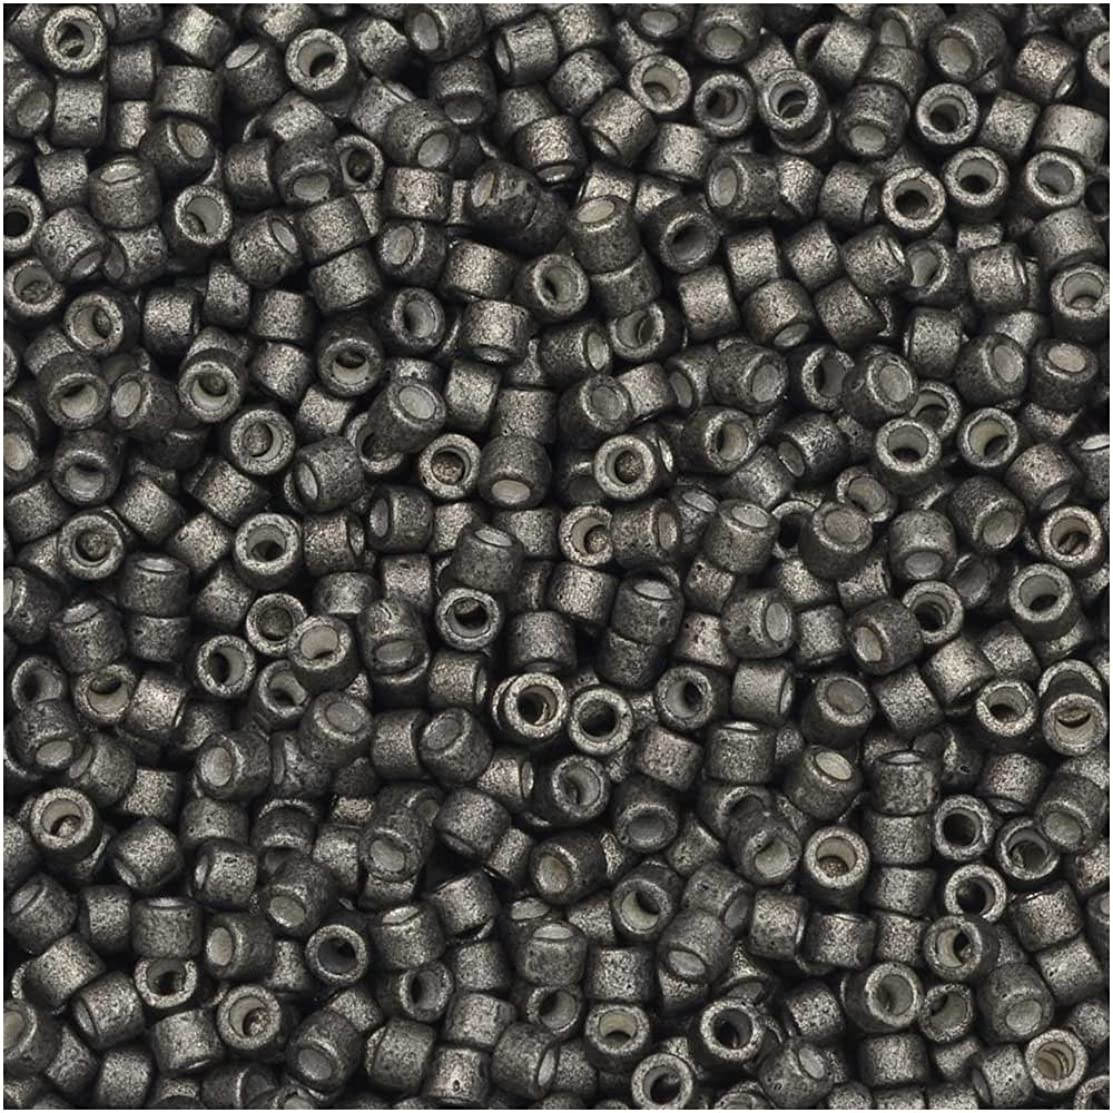 Galvanized Matte Graphite (Db1175) Delica Myiuki 11/0 Seed Bead 7.2 Gram Tube Approx 1400 Beads